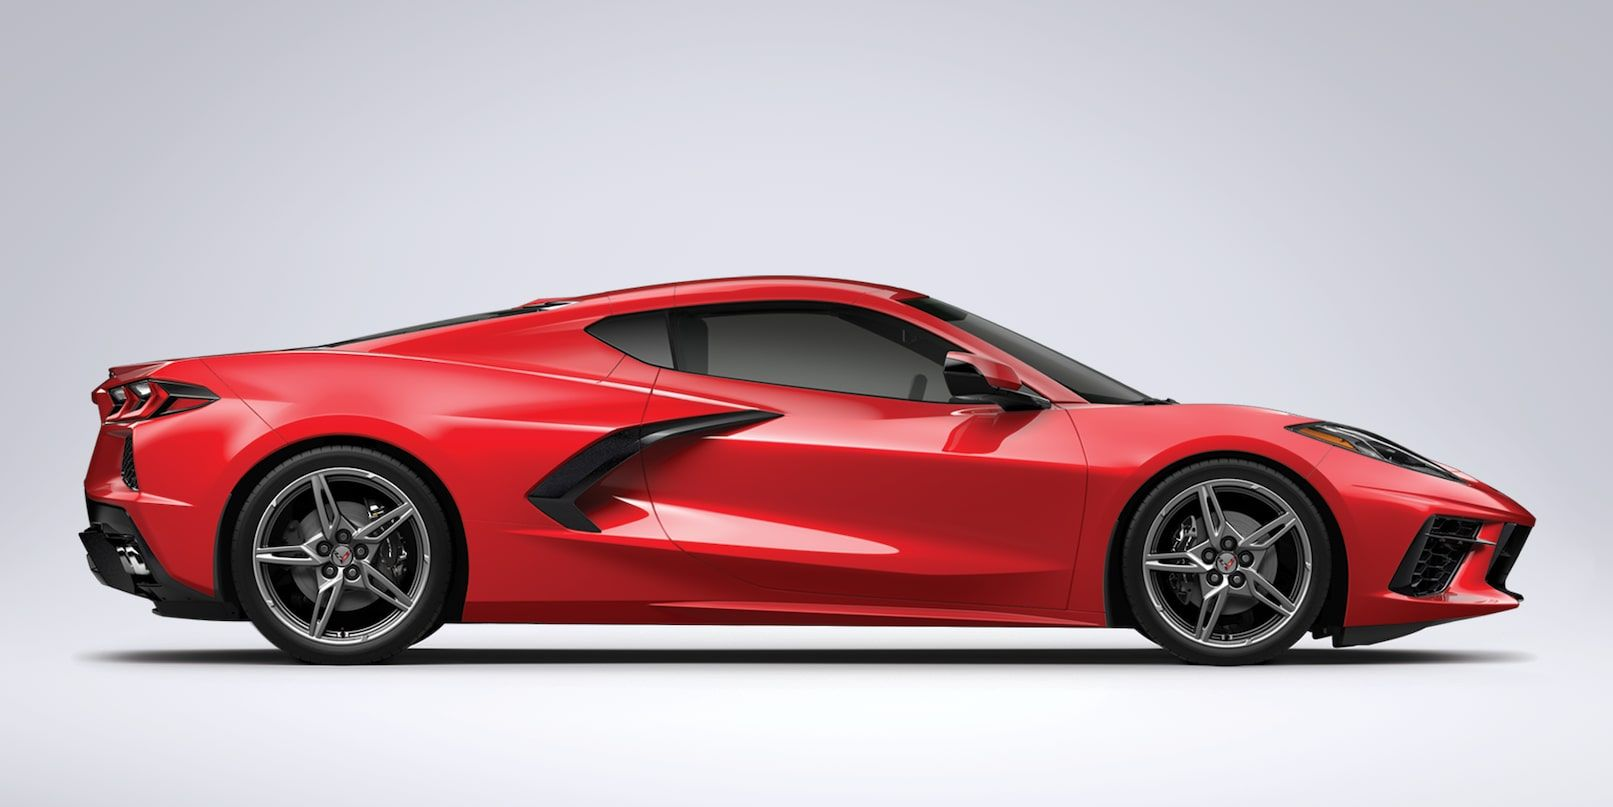 2020-corvette-reveal-design-04